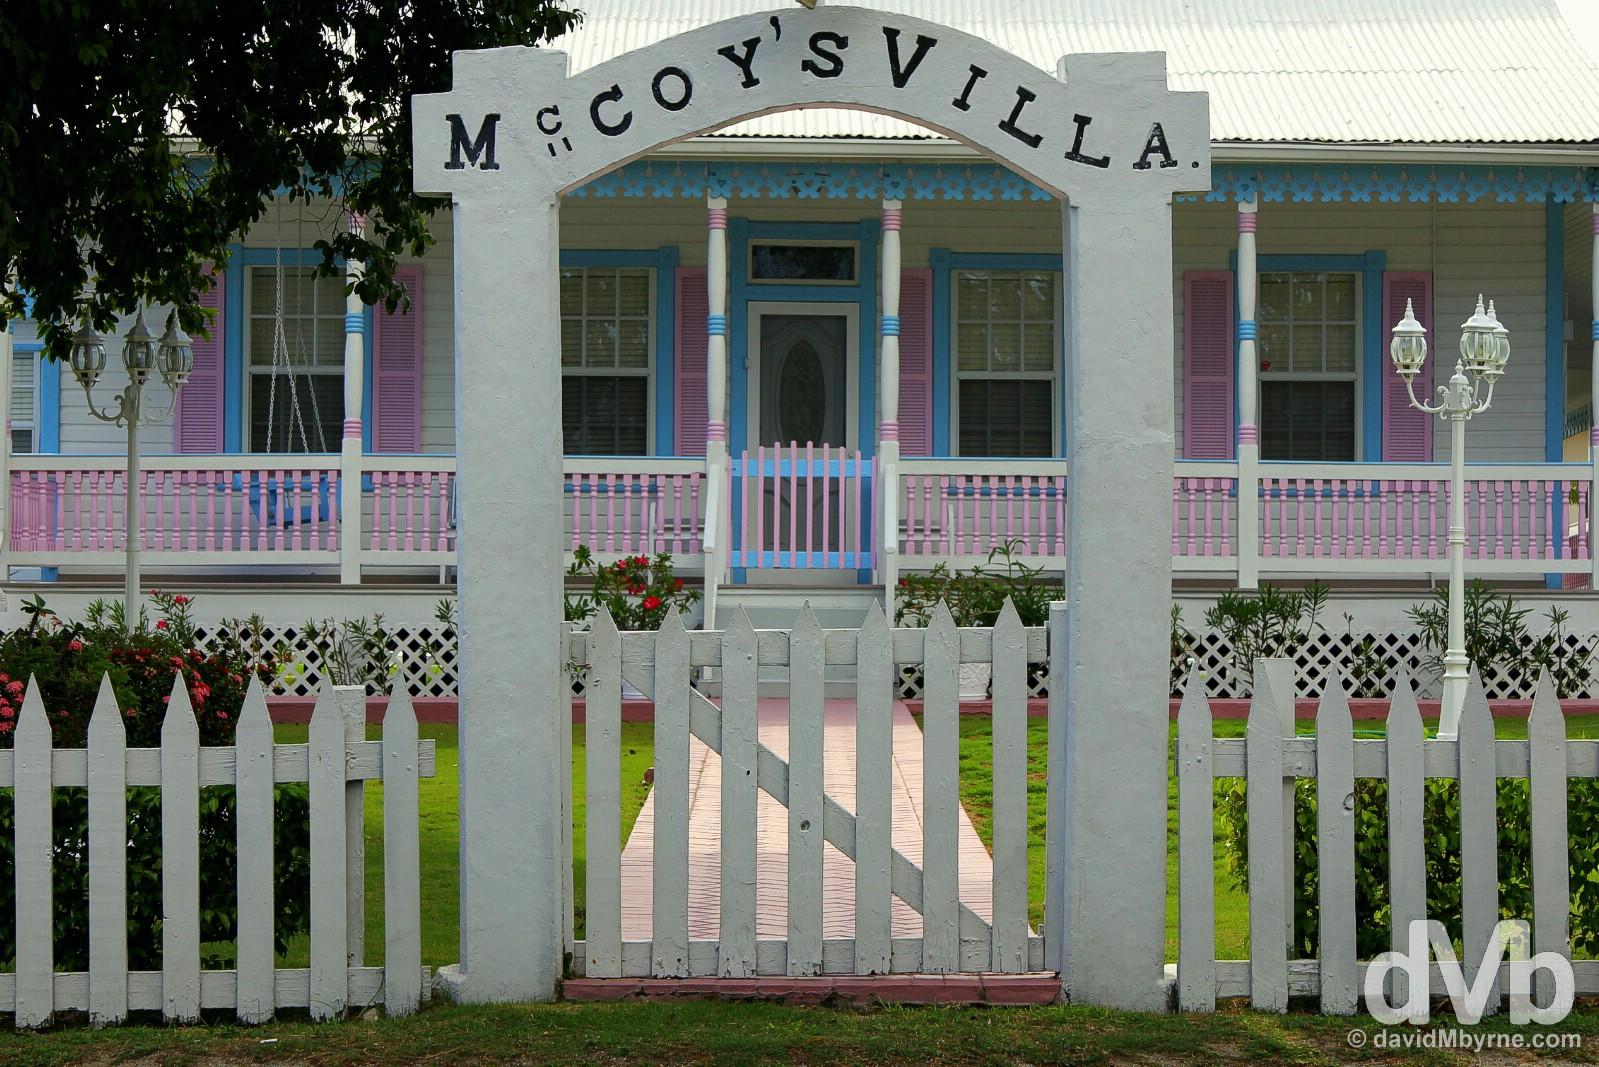 McCoy's Villa, Grand Cayman, Cayman Islands, Greater Antilles. May 12, 2015.